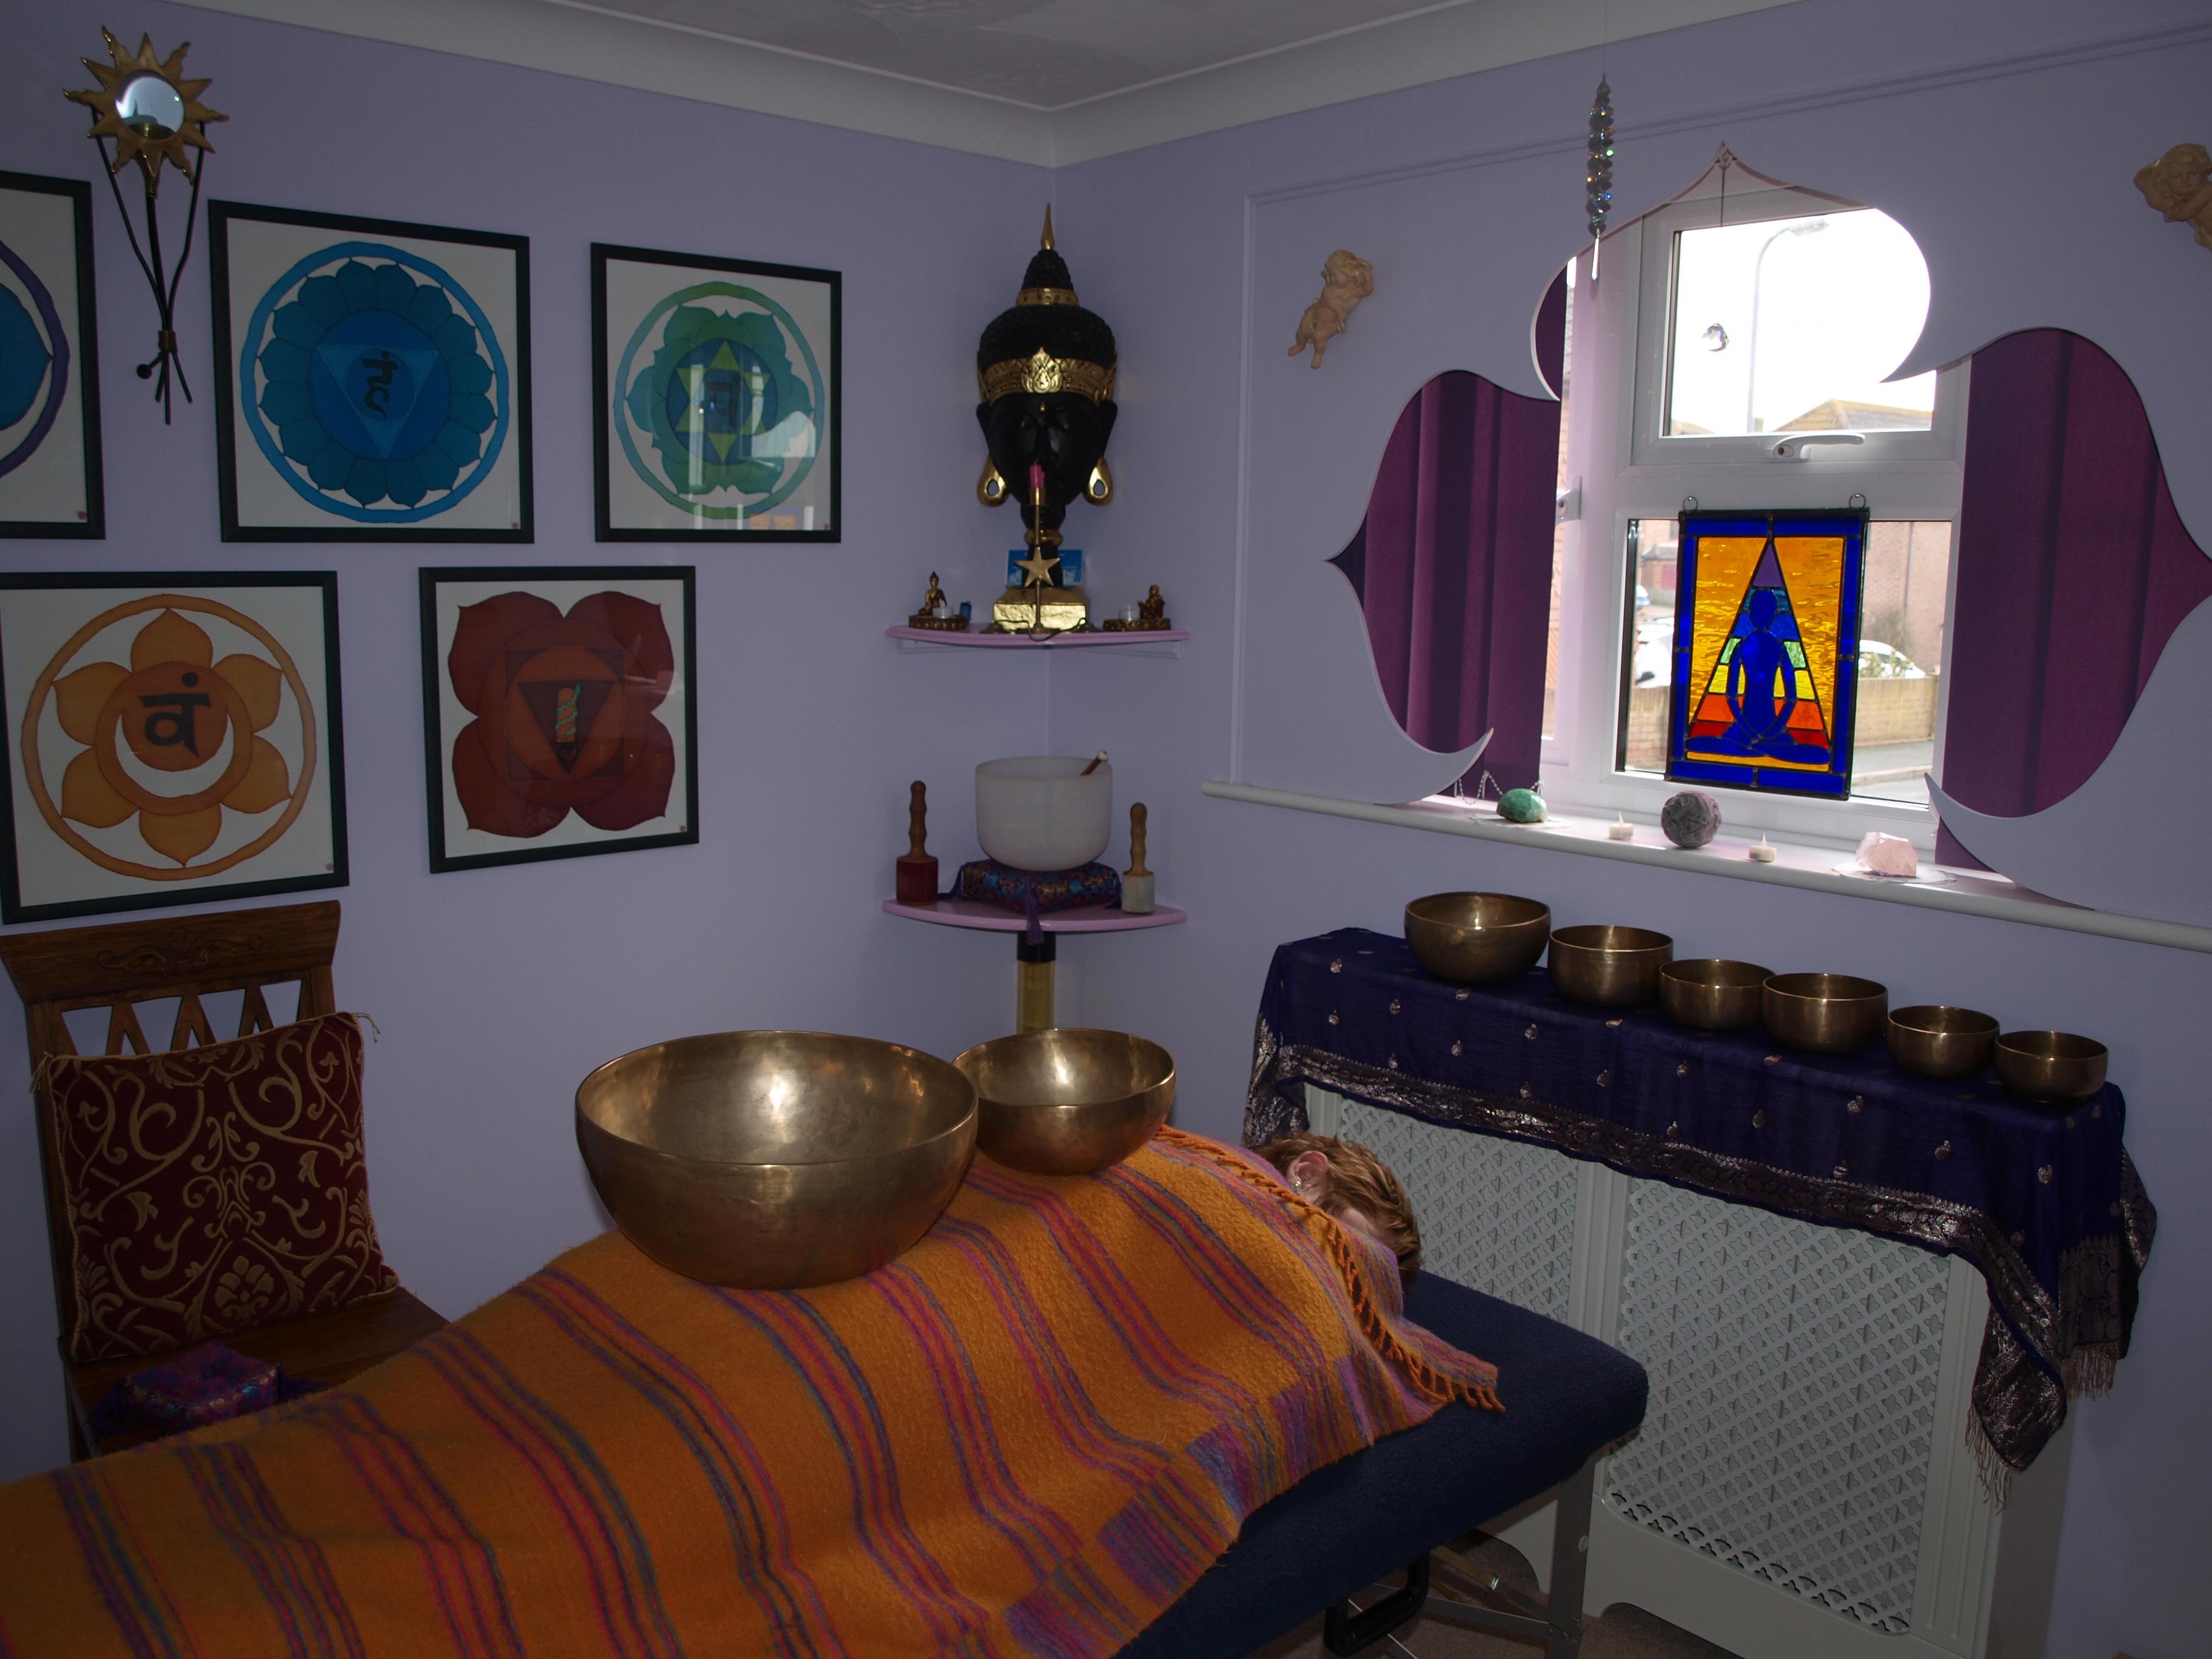 Reiki sound healing therapy sessions samtosha 4 u for Room decor 4u